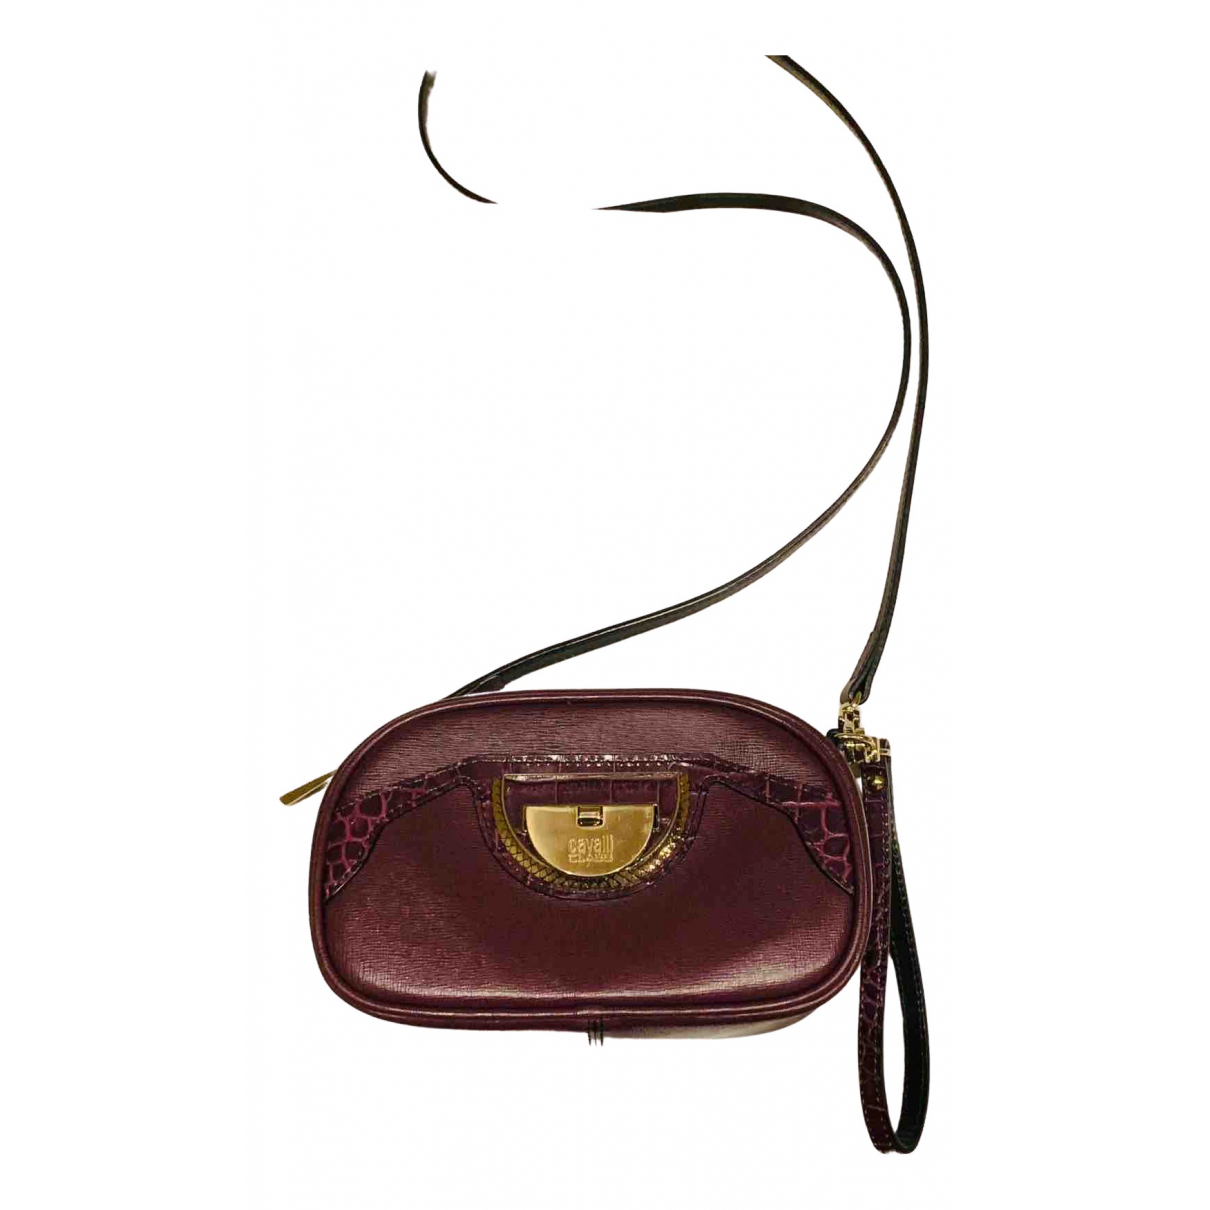 Class Cavalli \N Burgundy Leather handbag for Women \N